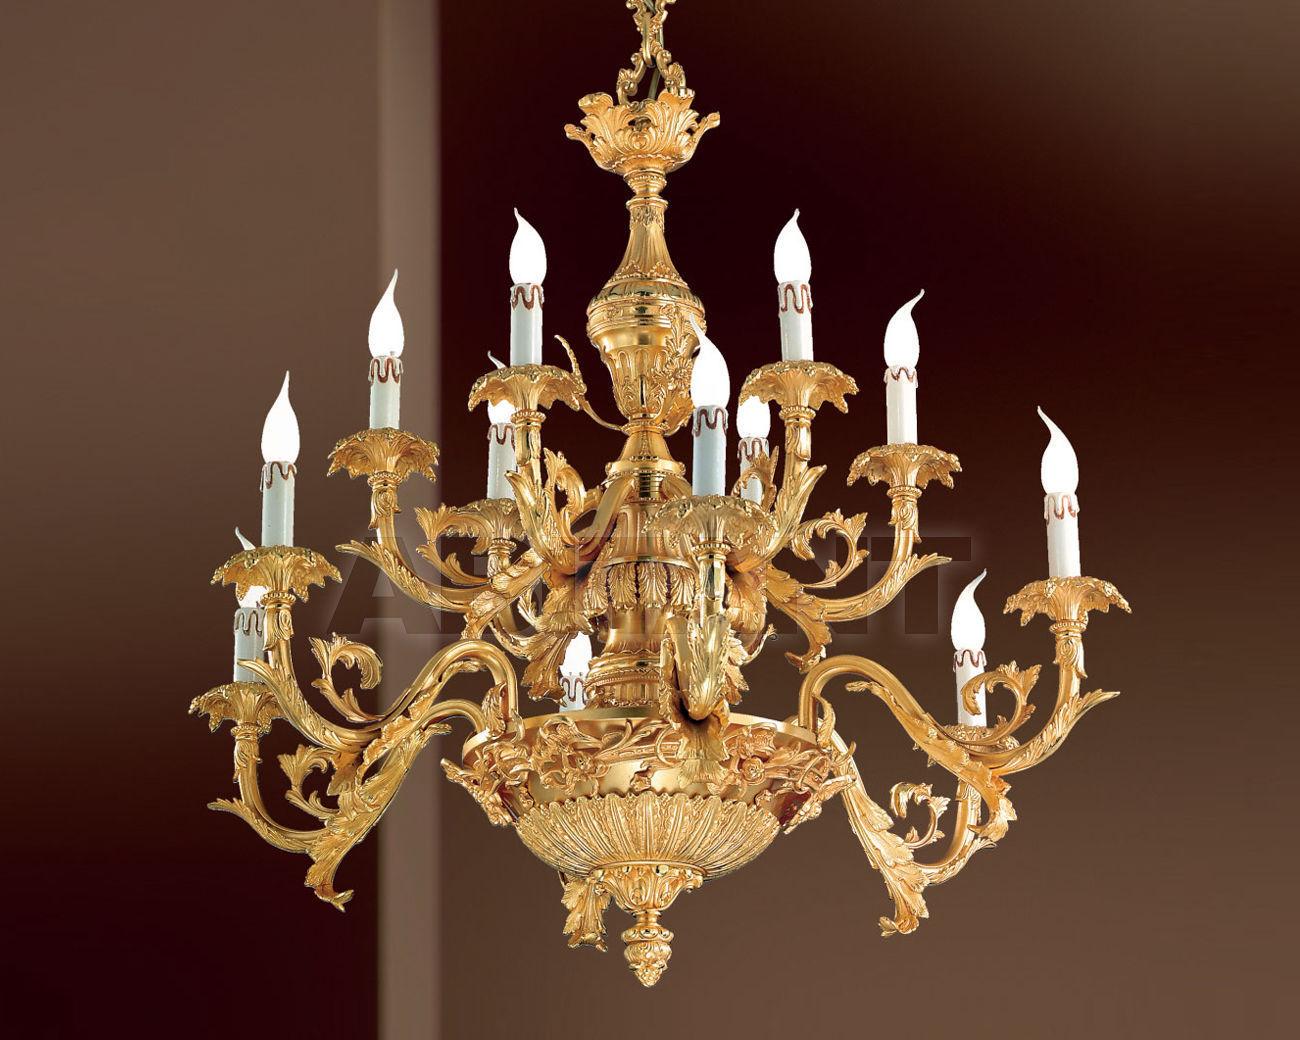 Купить Люстра F.B.A.I. Candeliere 3167/6+6